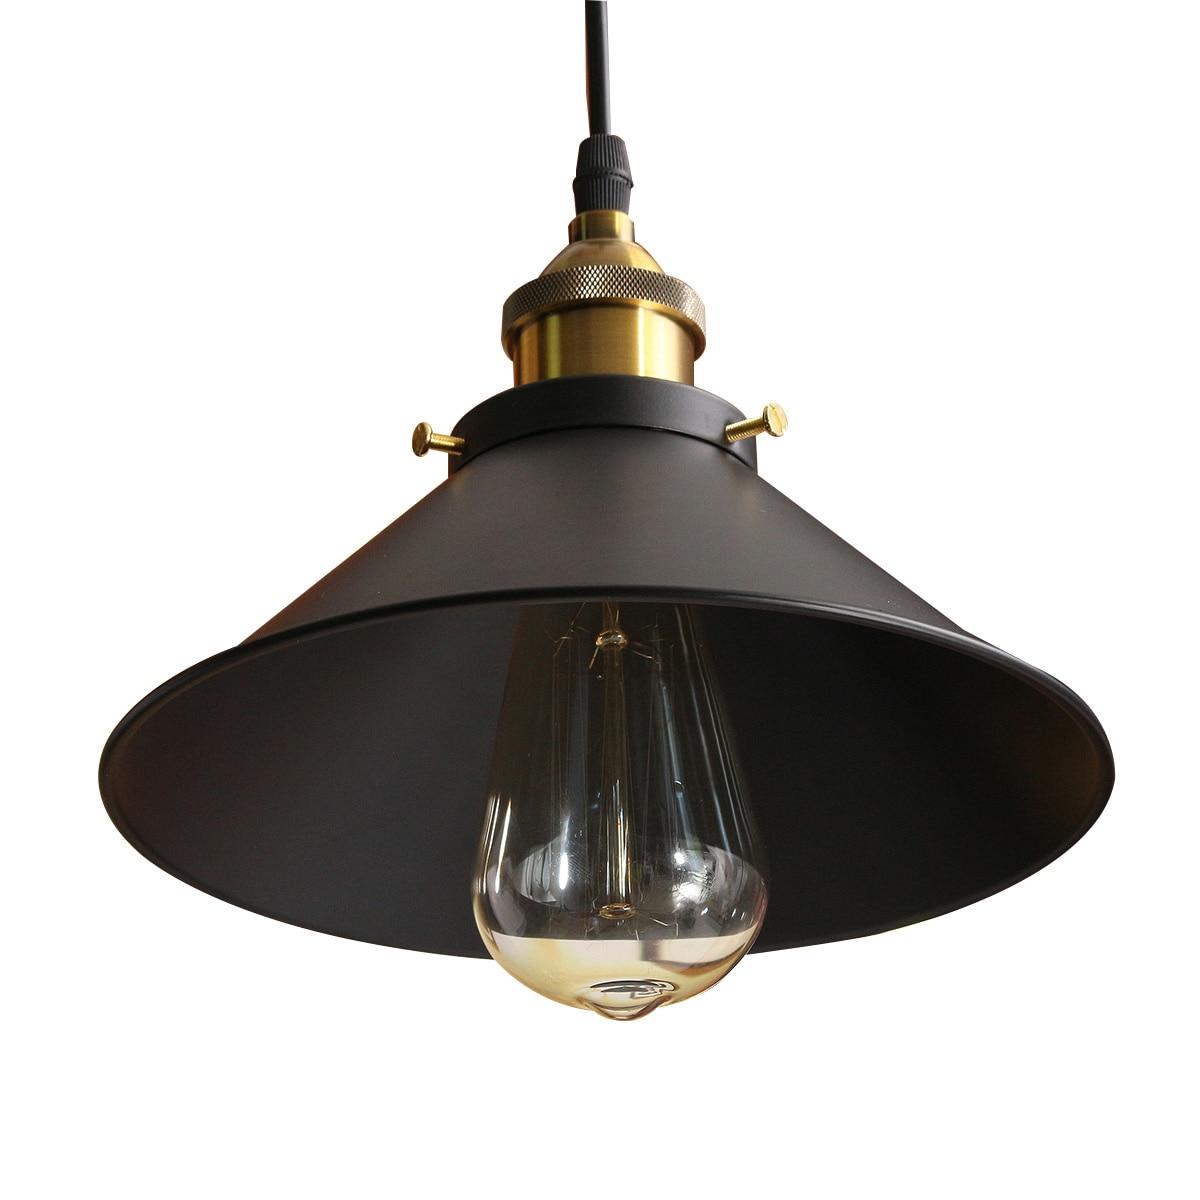 cheapest KARWEN 18W 24W 36W 48W LED Round Panel Light 85-265V Surface Mounted leds Square ceiling down lampada led lamp light for Bedroom